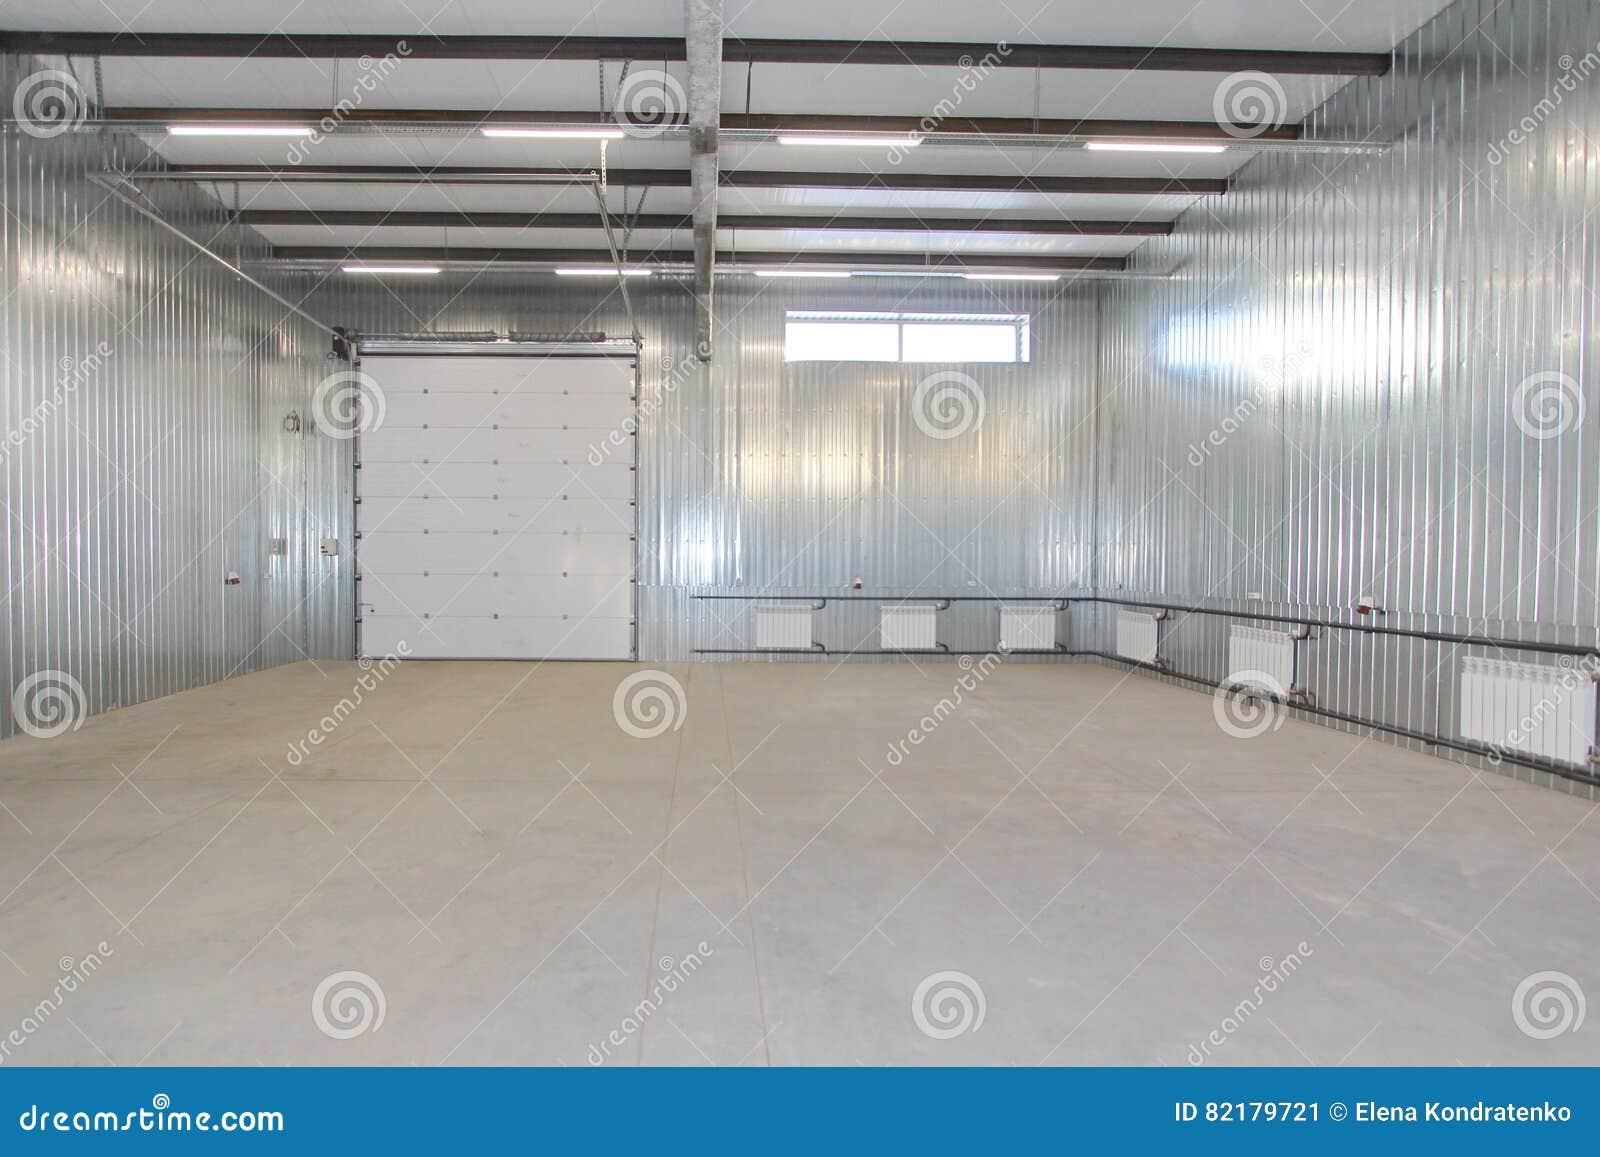 Interior windows - Empty Parking Garage Warehouse Interior With Large White Gates And Windows Inside Stock Photo